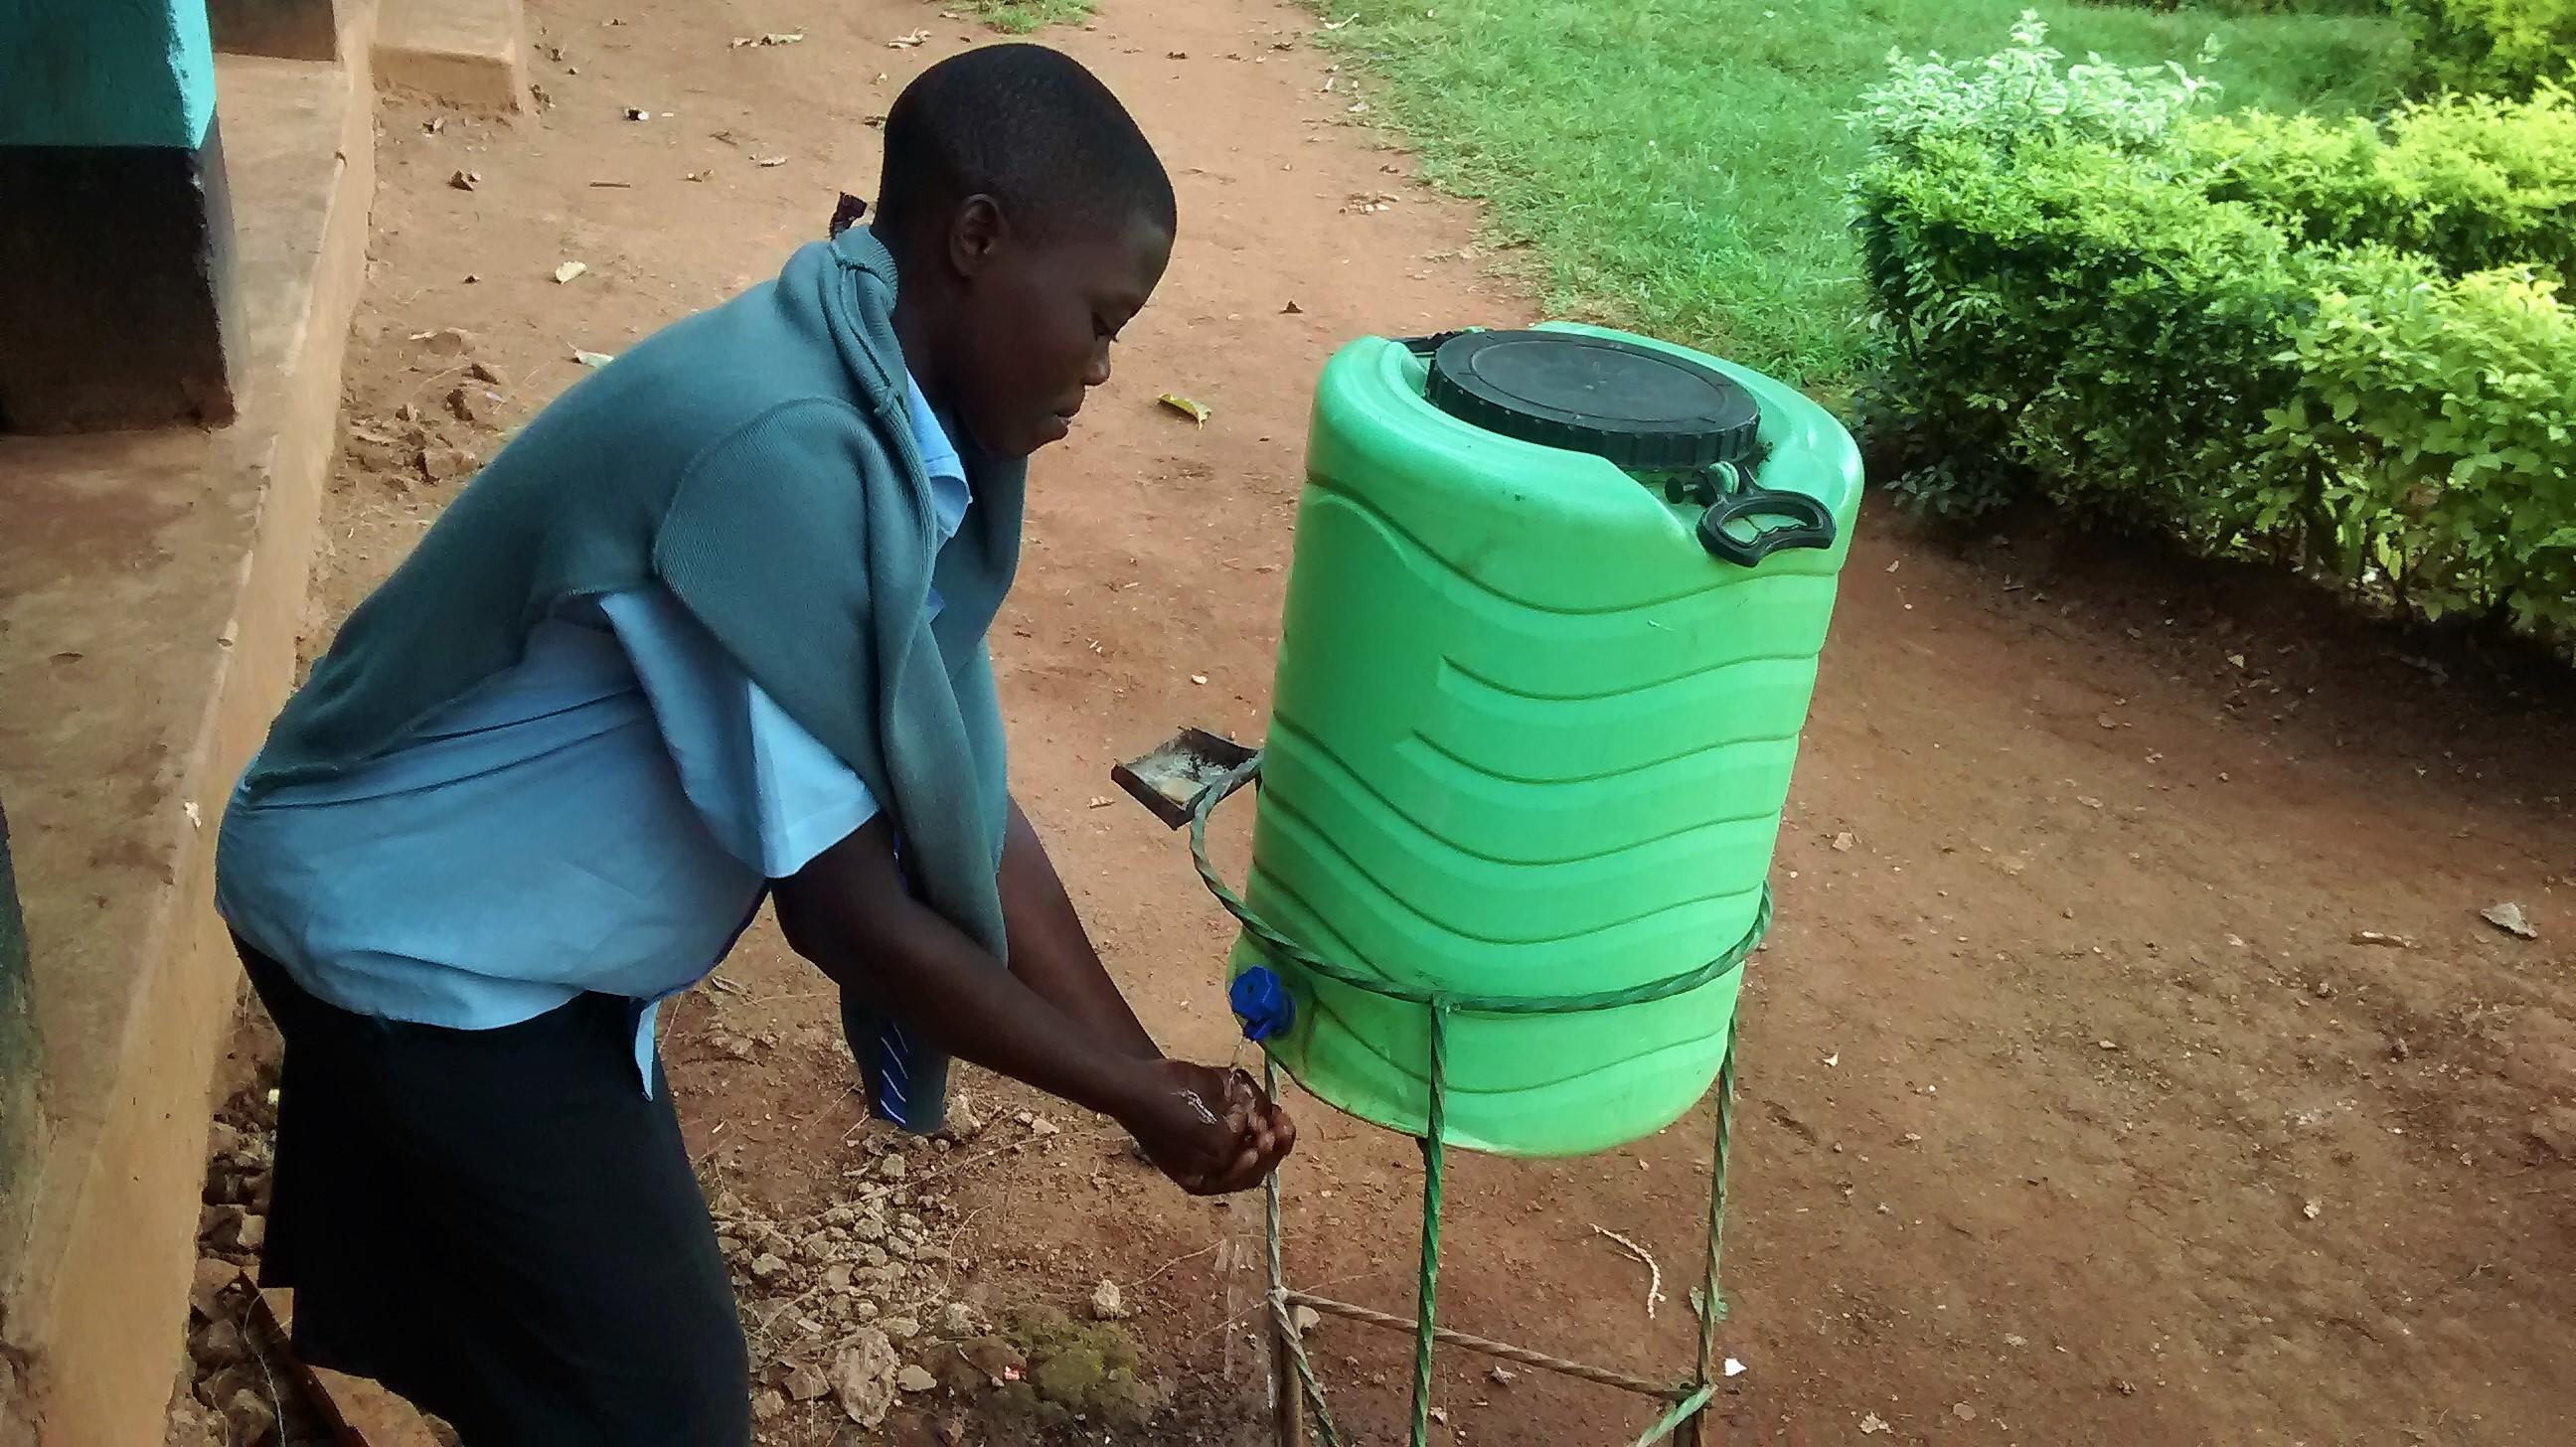 4 kenya4667 hand-washing